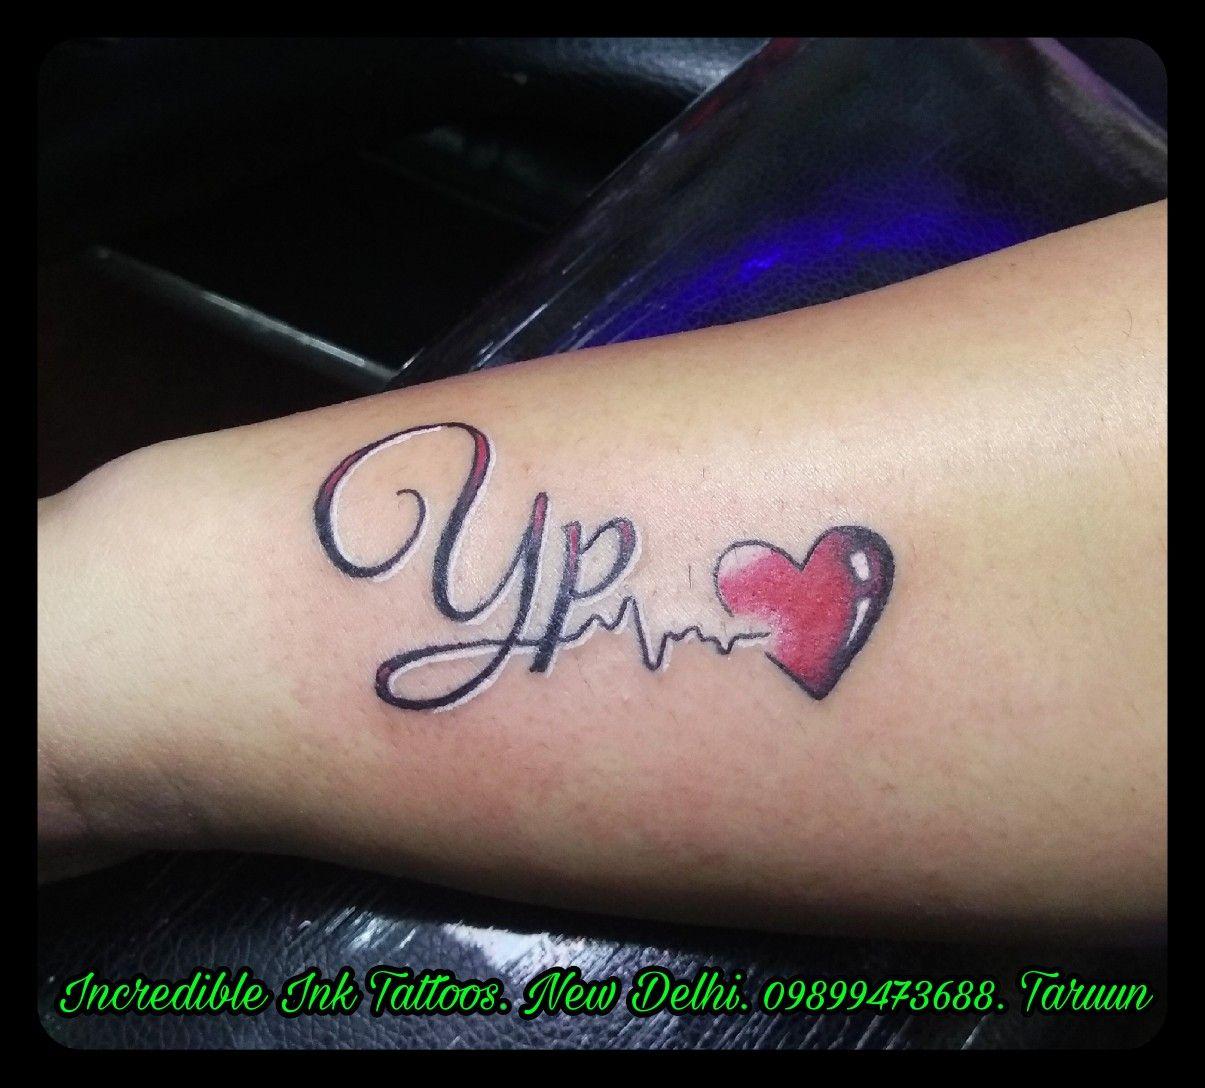 Yp Initial Tattoo Heartbeat Yp Initial Heartbeat Tattoo Call Whatsapp 09899473688 Heartbeat Tattoo Heartbeat Tattoo Design Love Tattoo On Hand